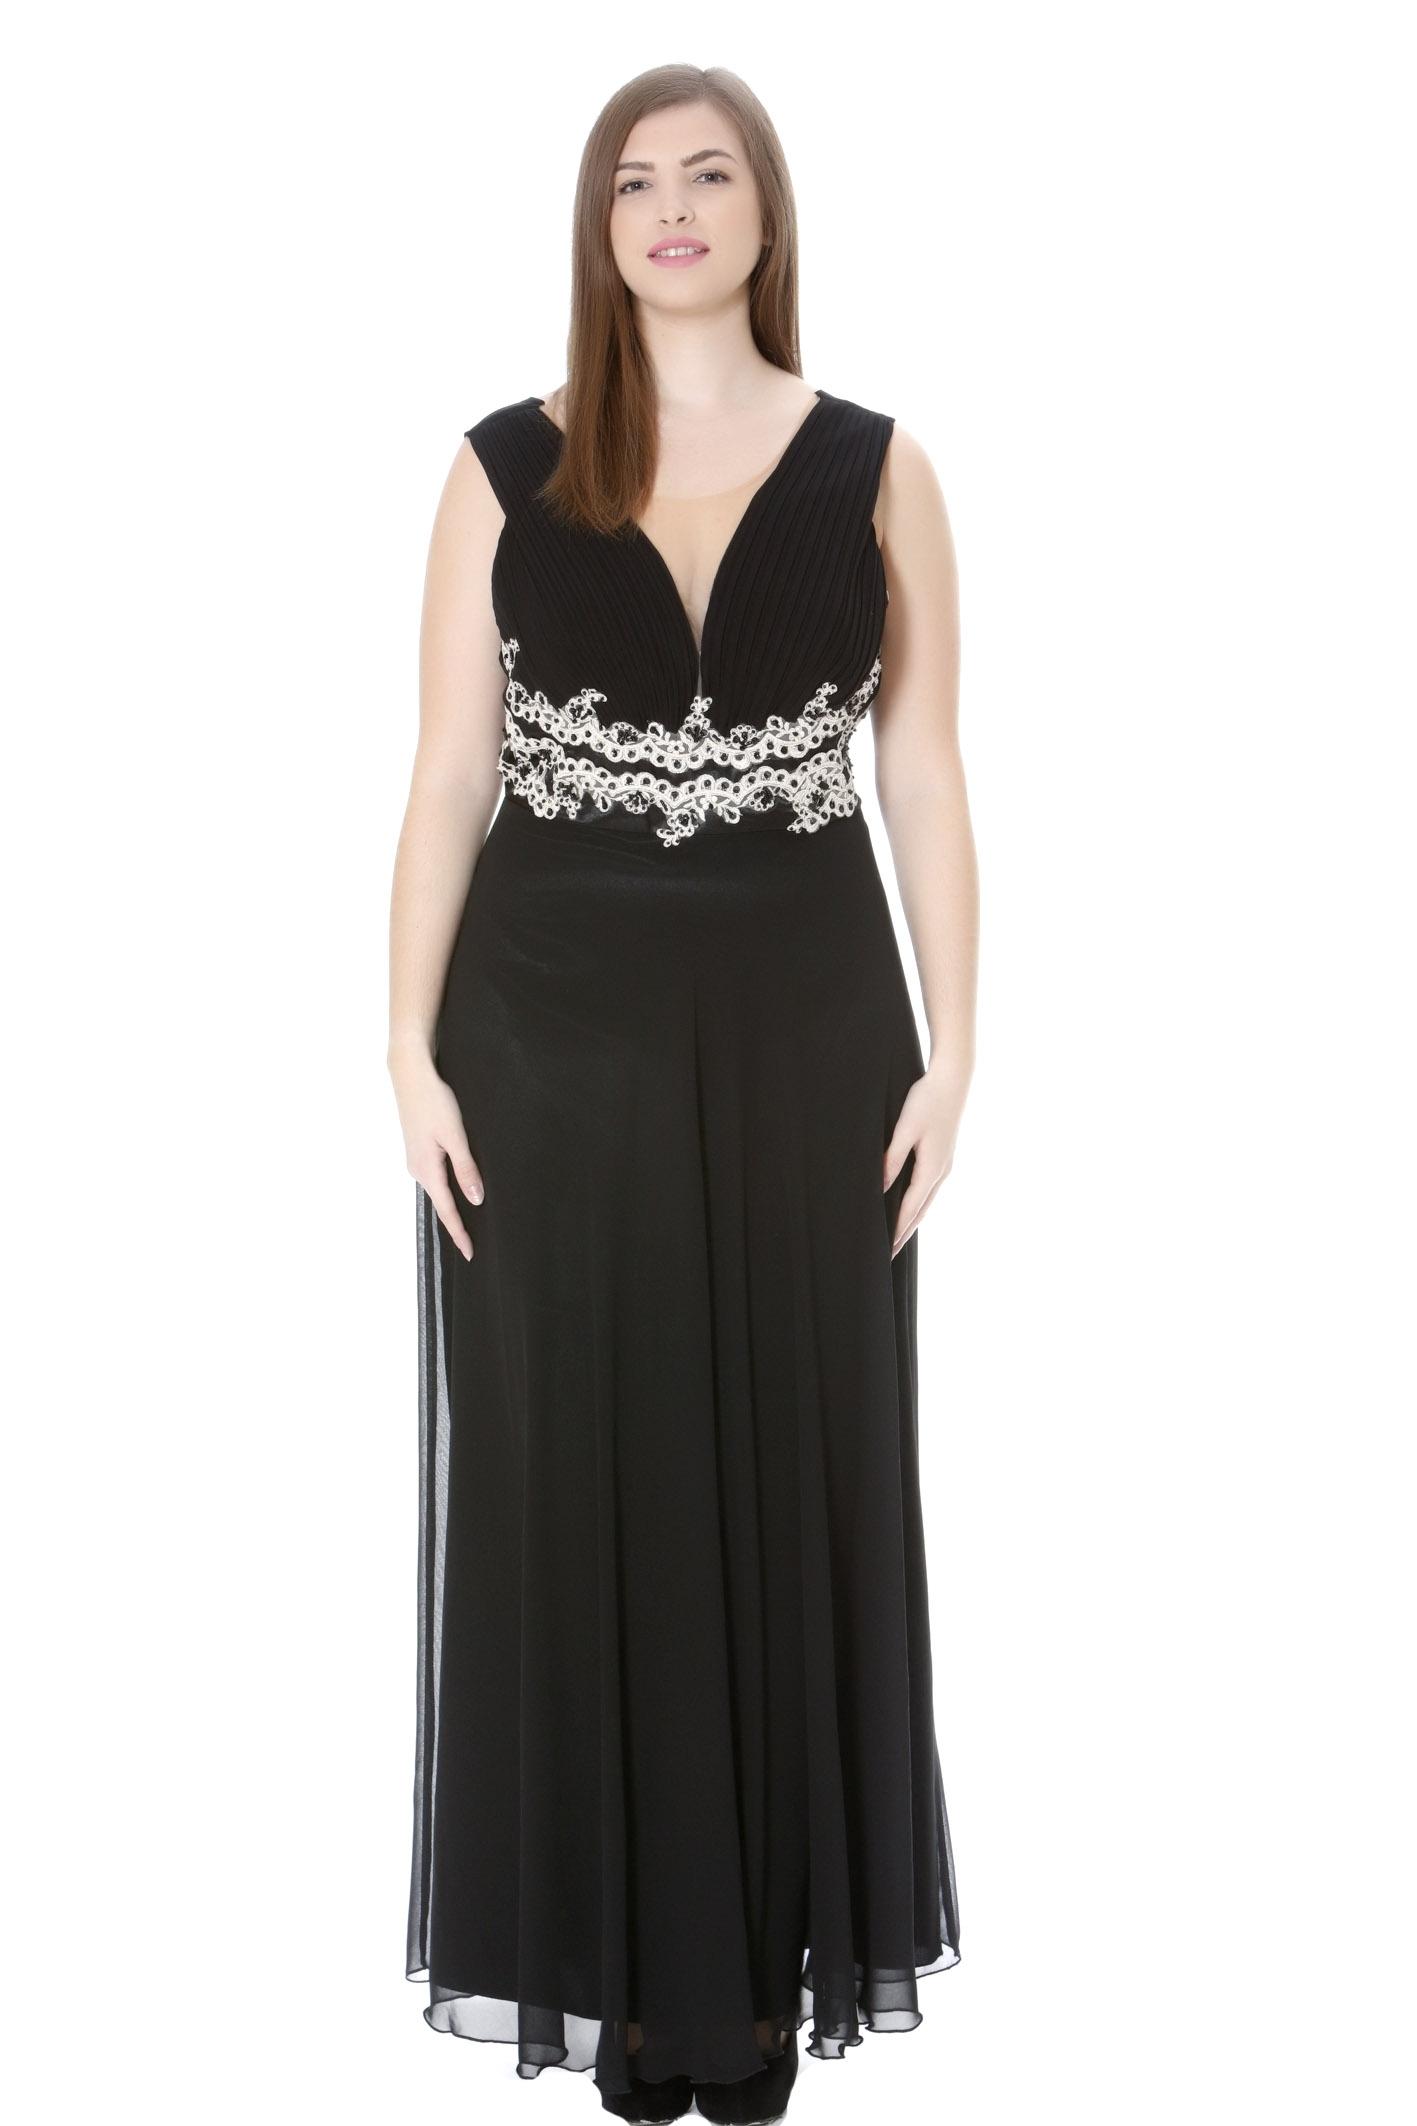 2aecdb1c0f0c Φόρεμα maxi Μουσελίνα Αμάνικο Εσωτερική σατέν φόδρα Μαύρο χρώμα Πλισέ  μπούστο και δαντέλα με στρας στην